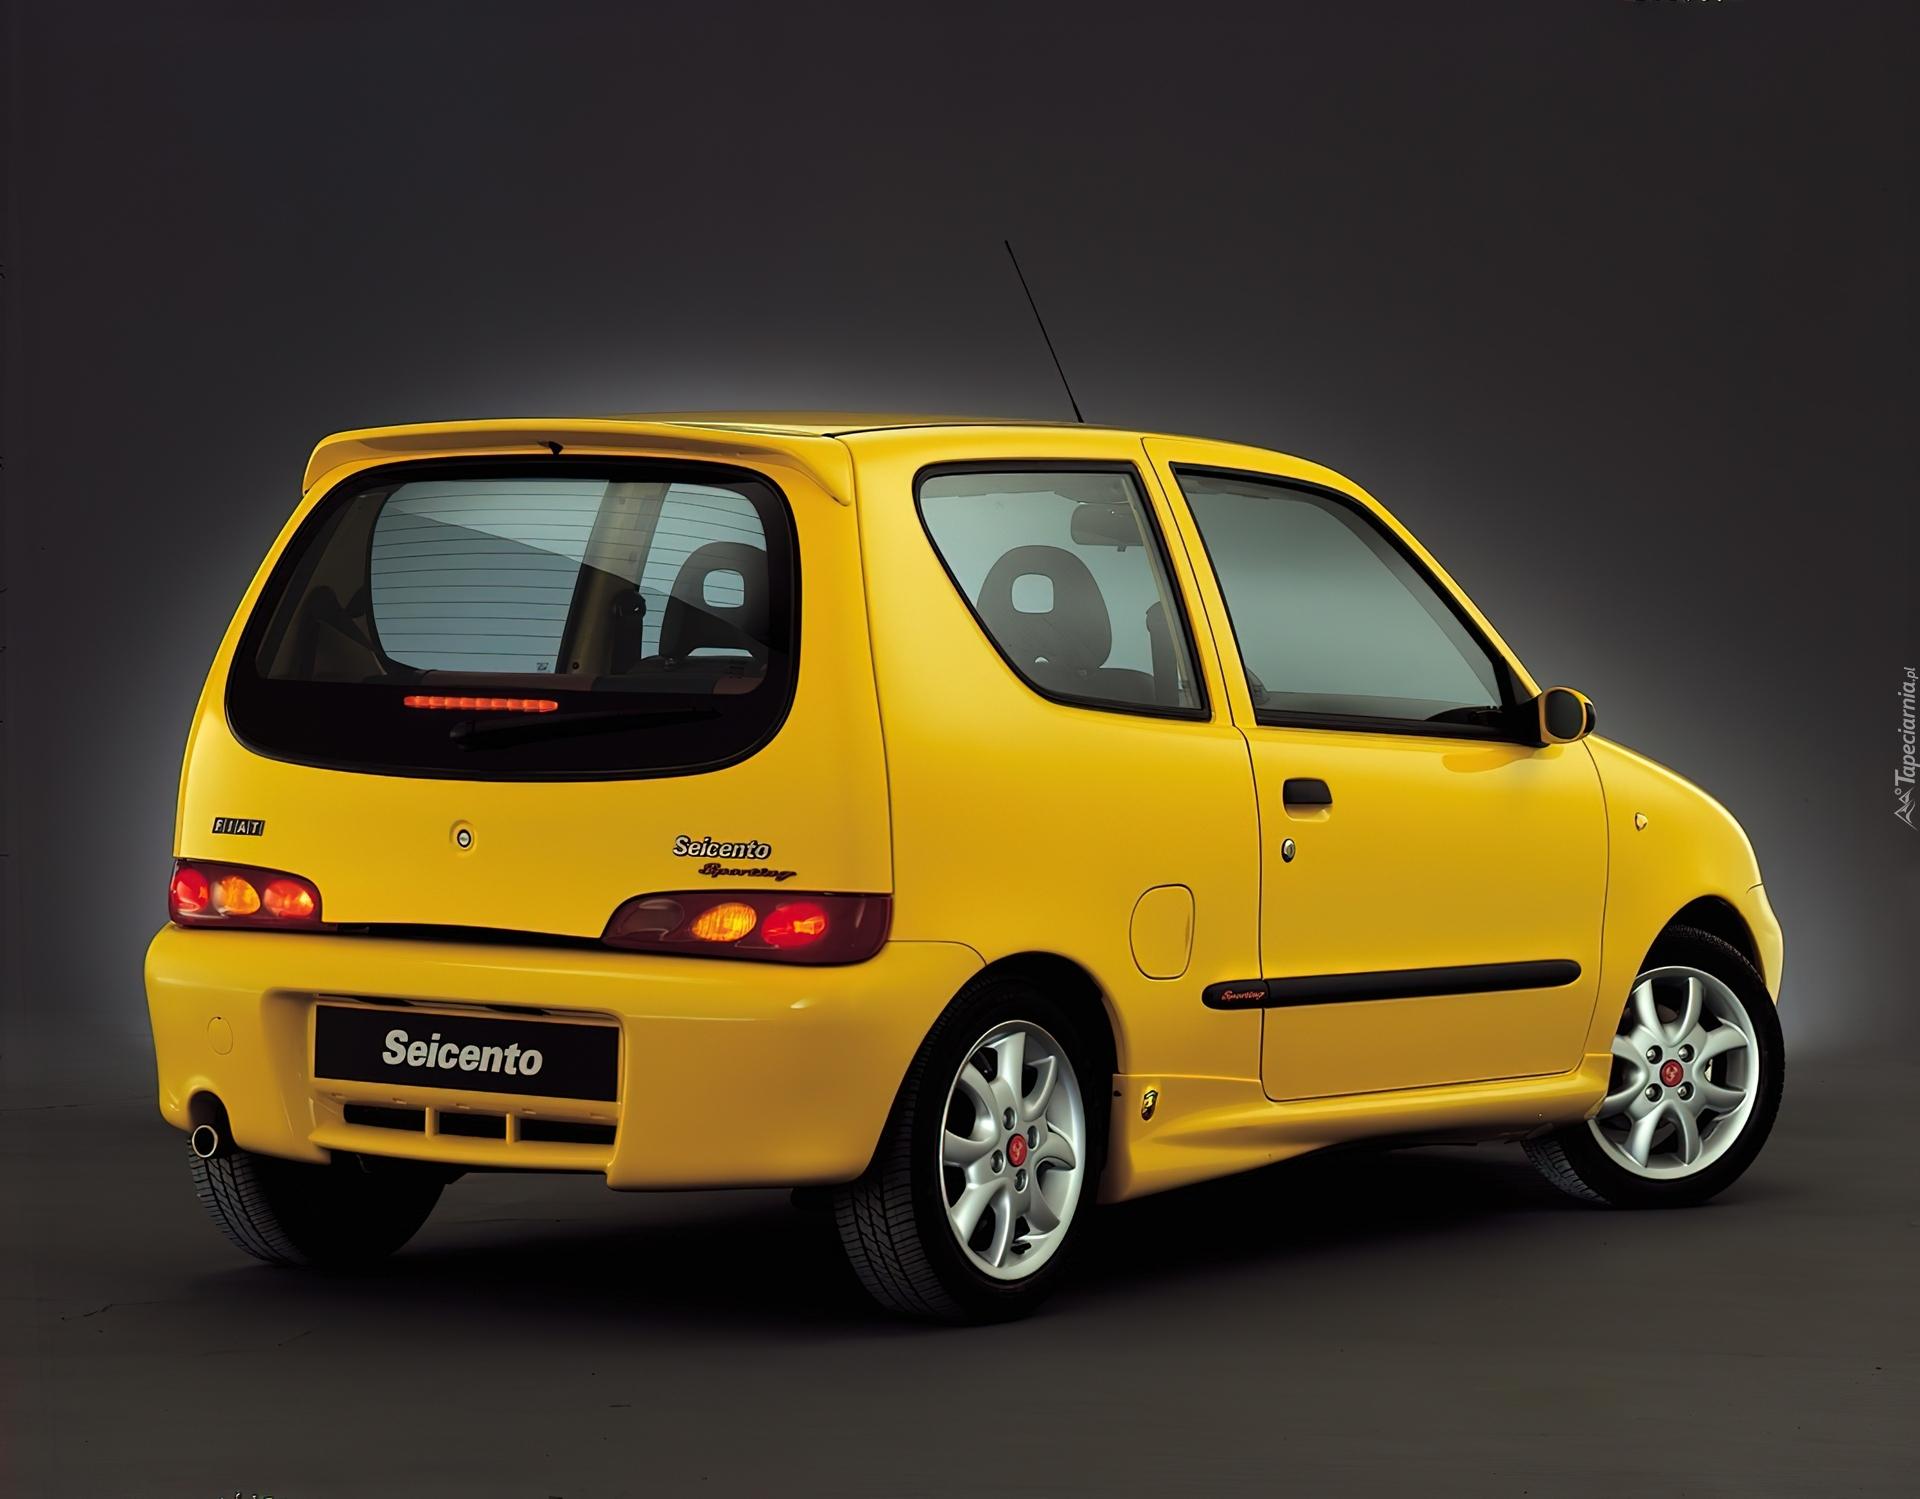 Fiat Seicento, Sporting